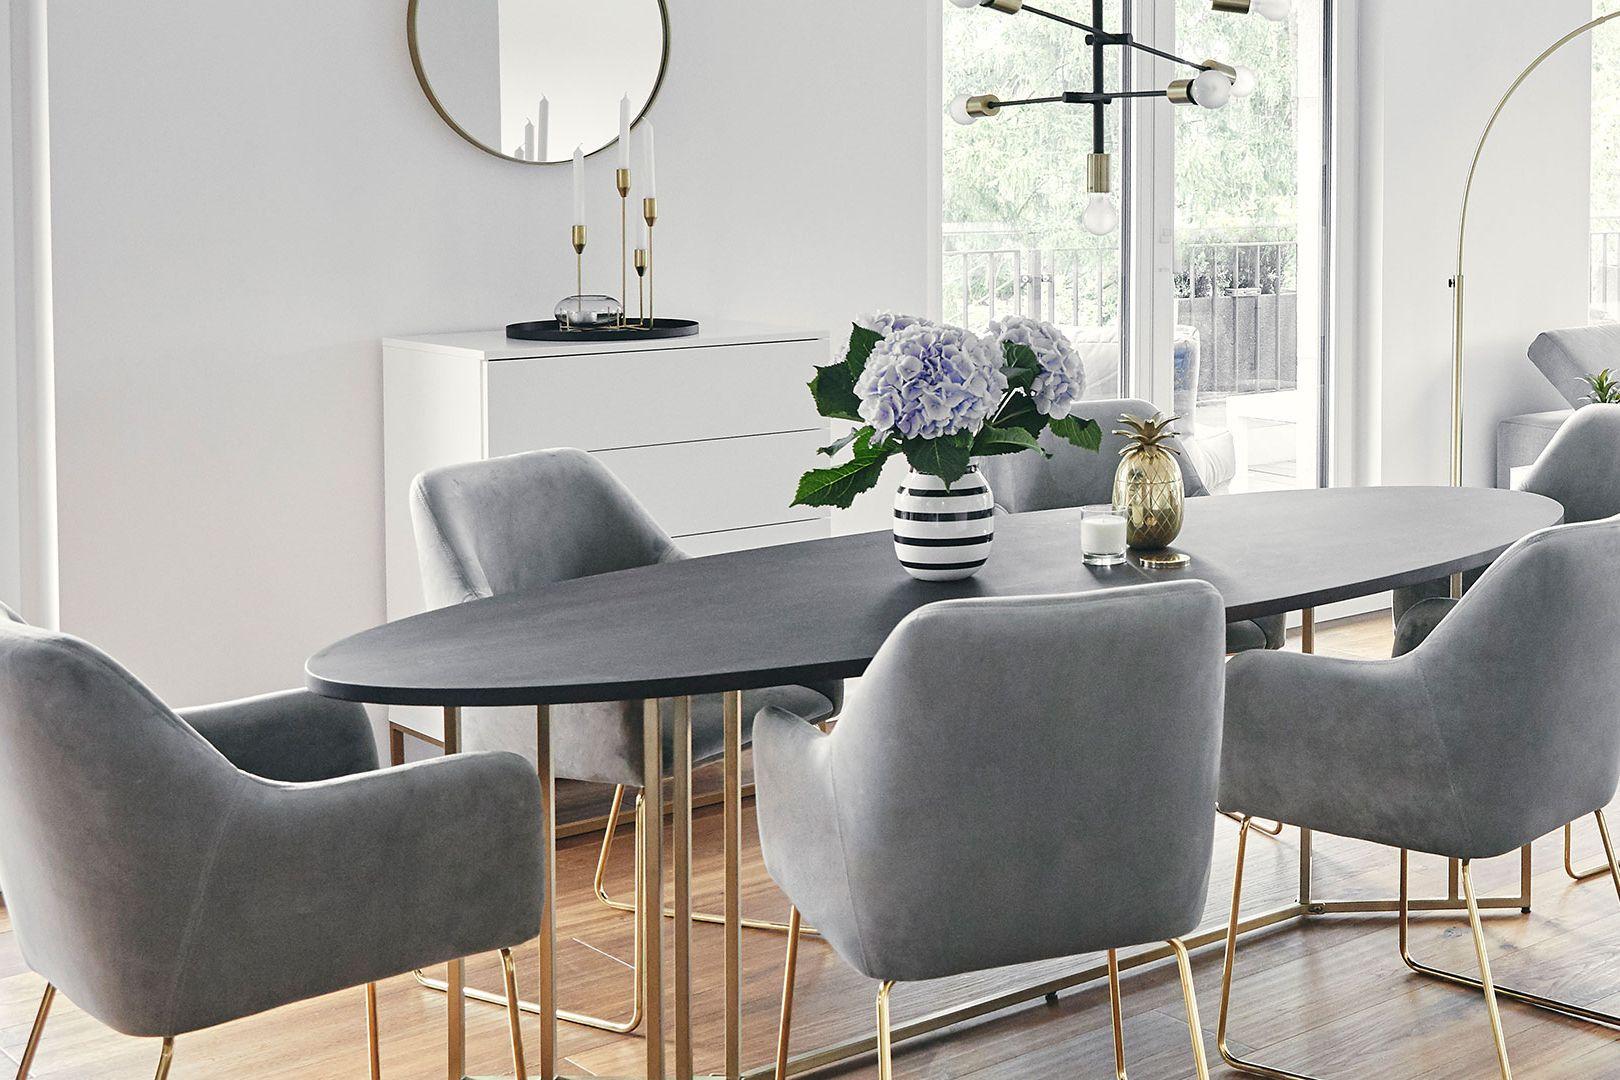 De elegante tafel